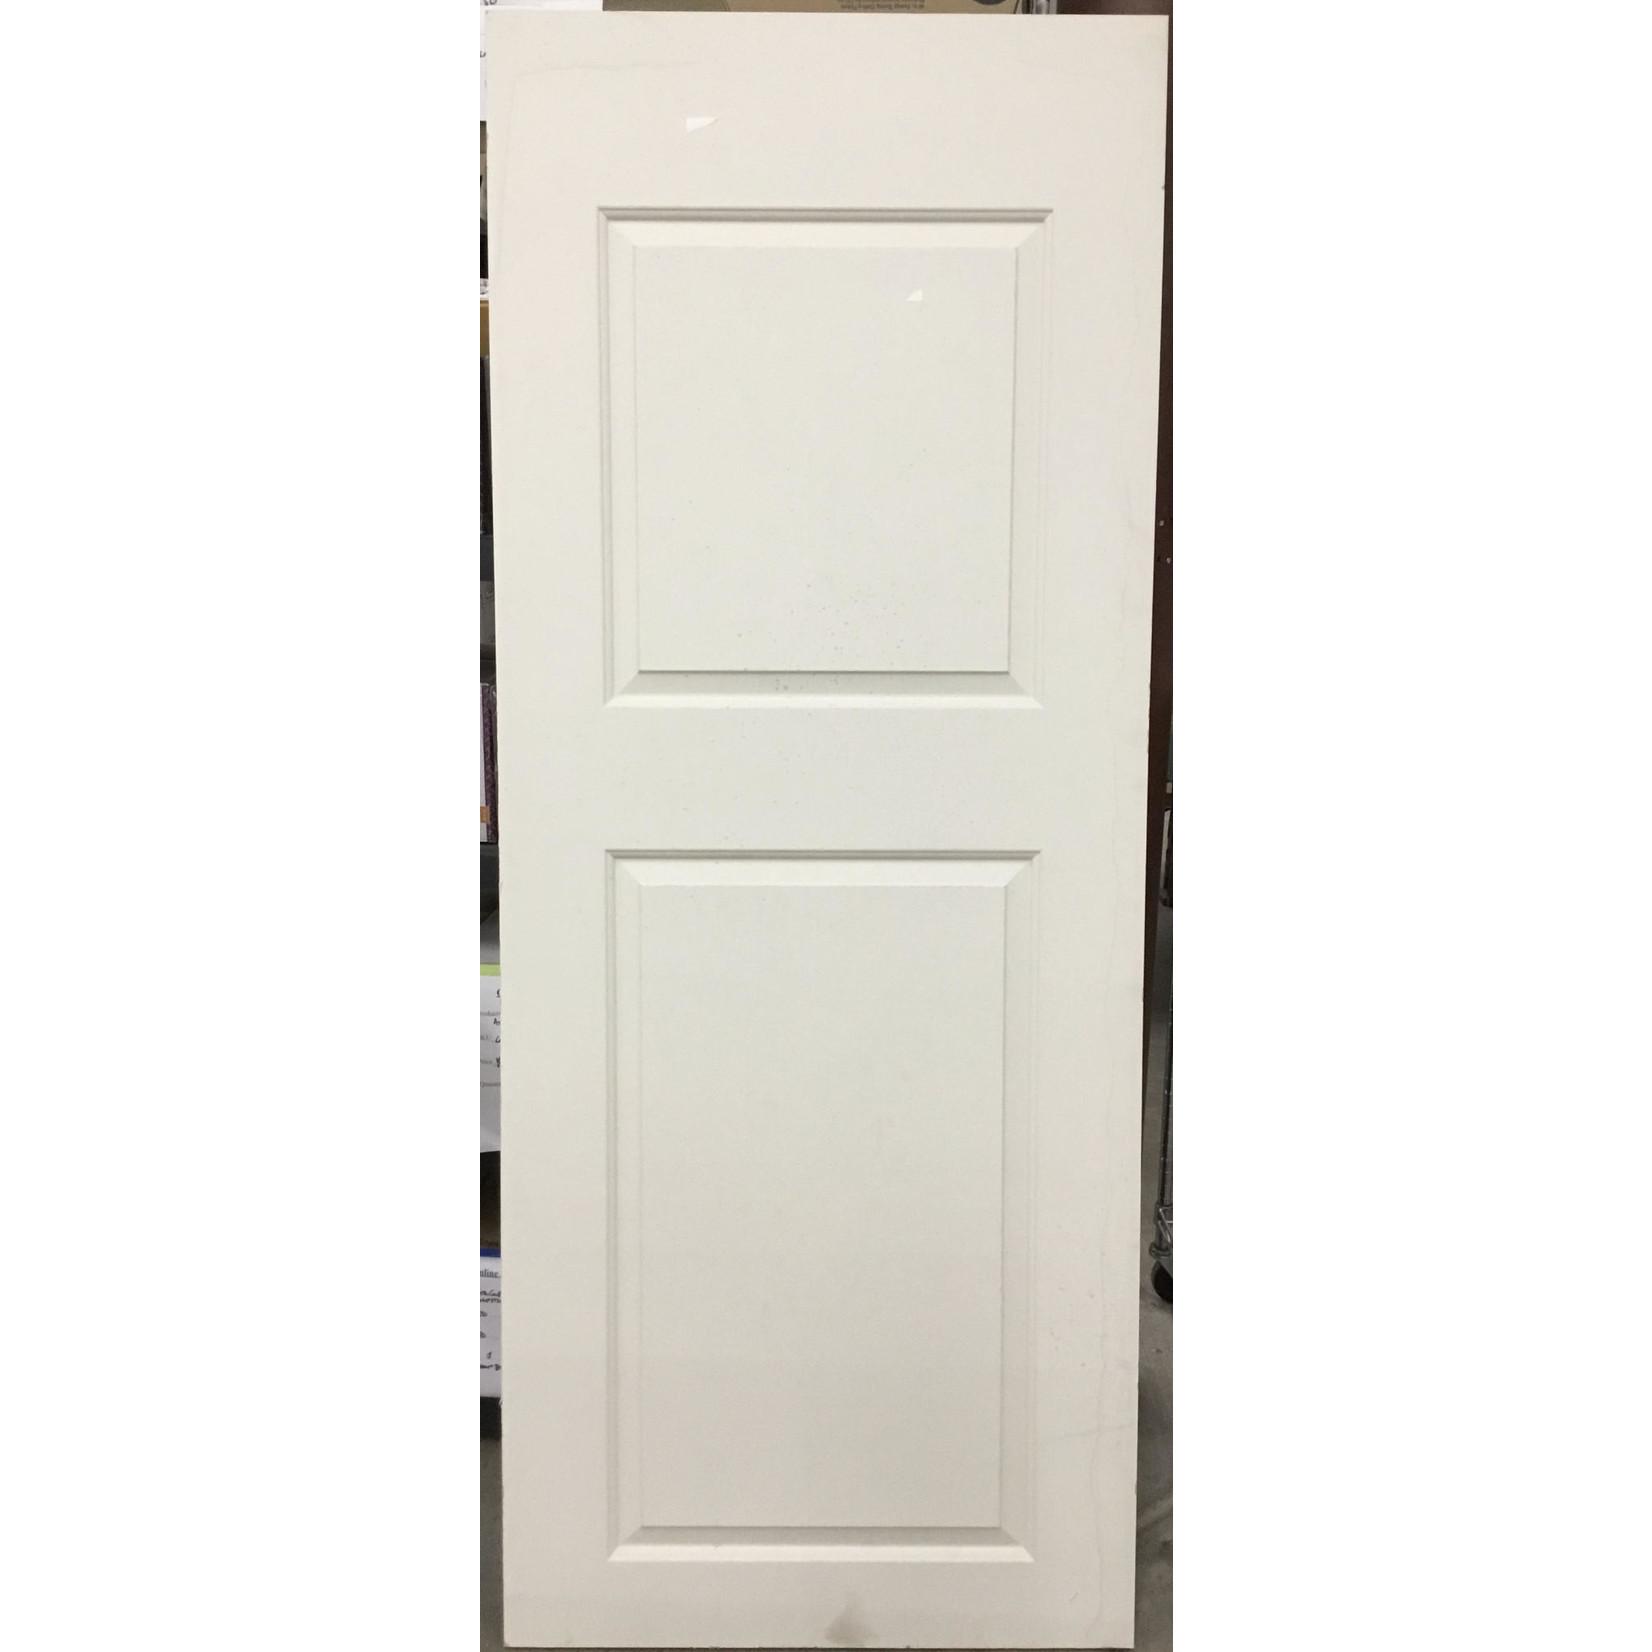 10616 Used 2 panel square top interior door slab